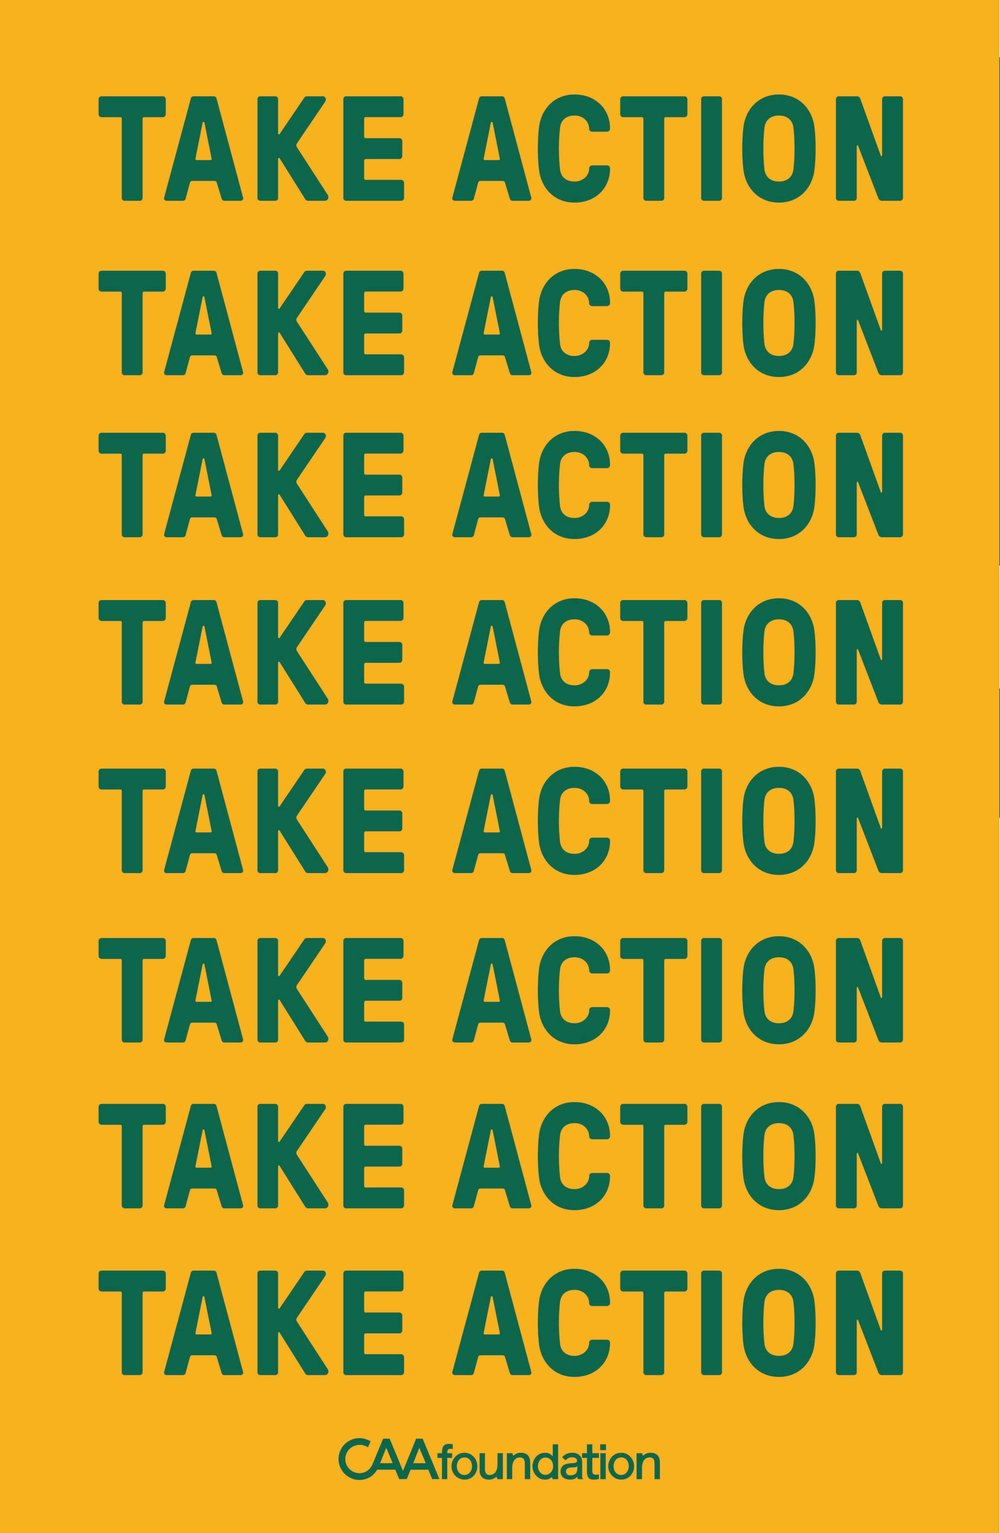 Take_Action_Posters_v5-09.jpg